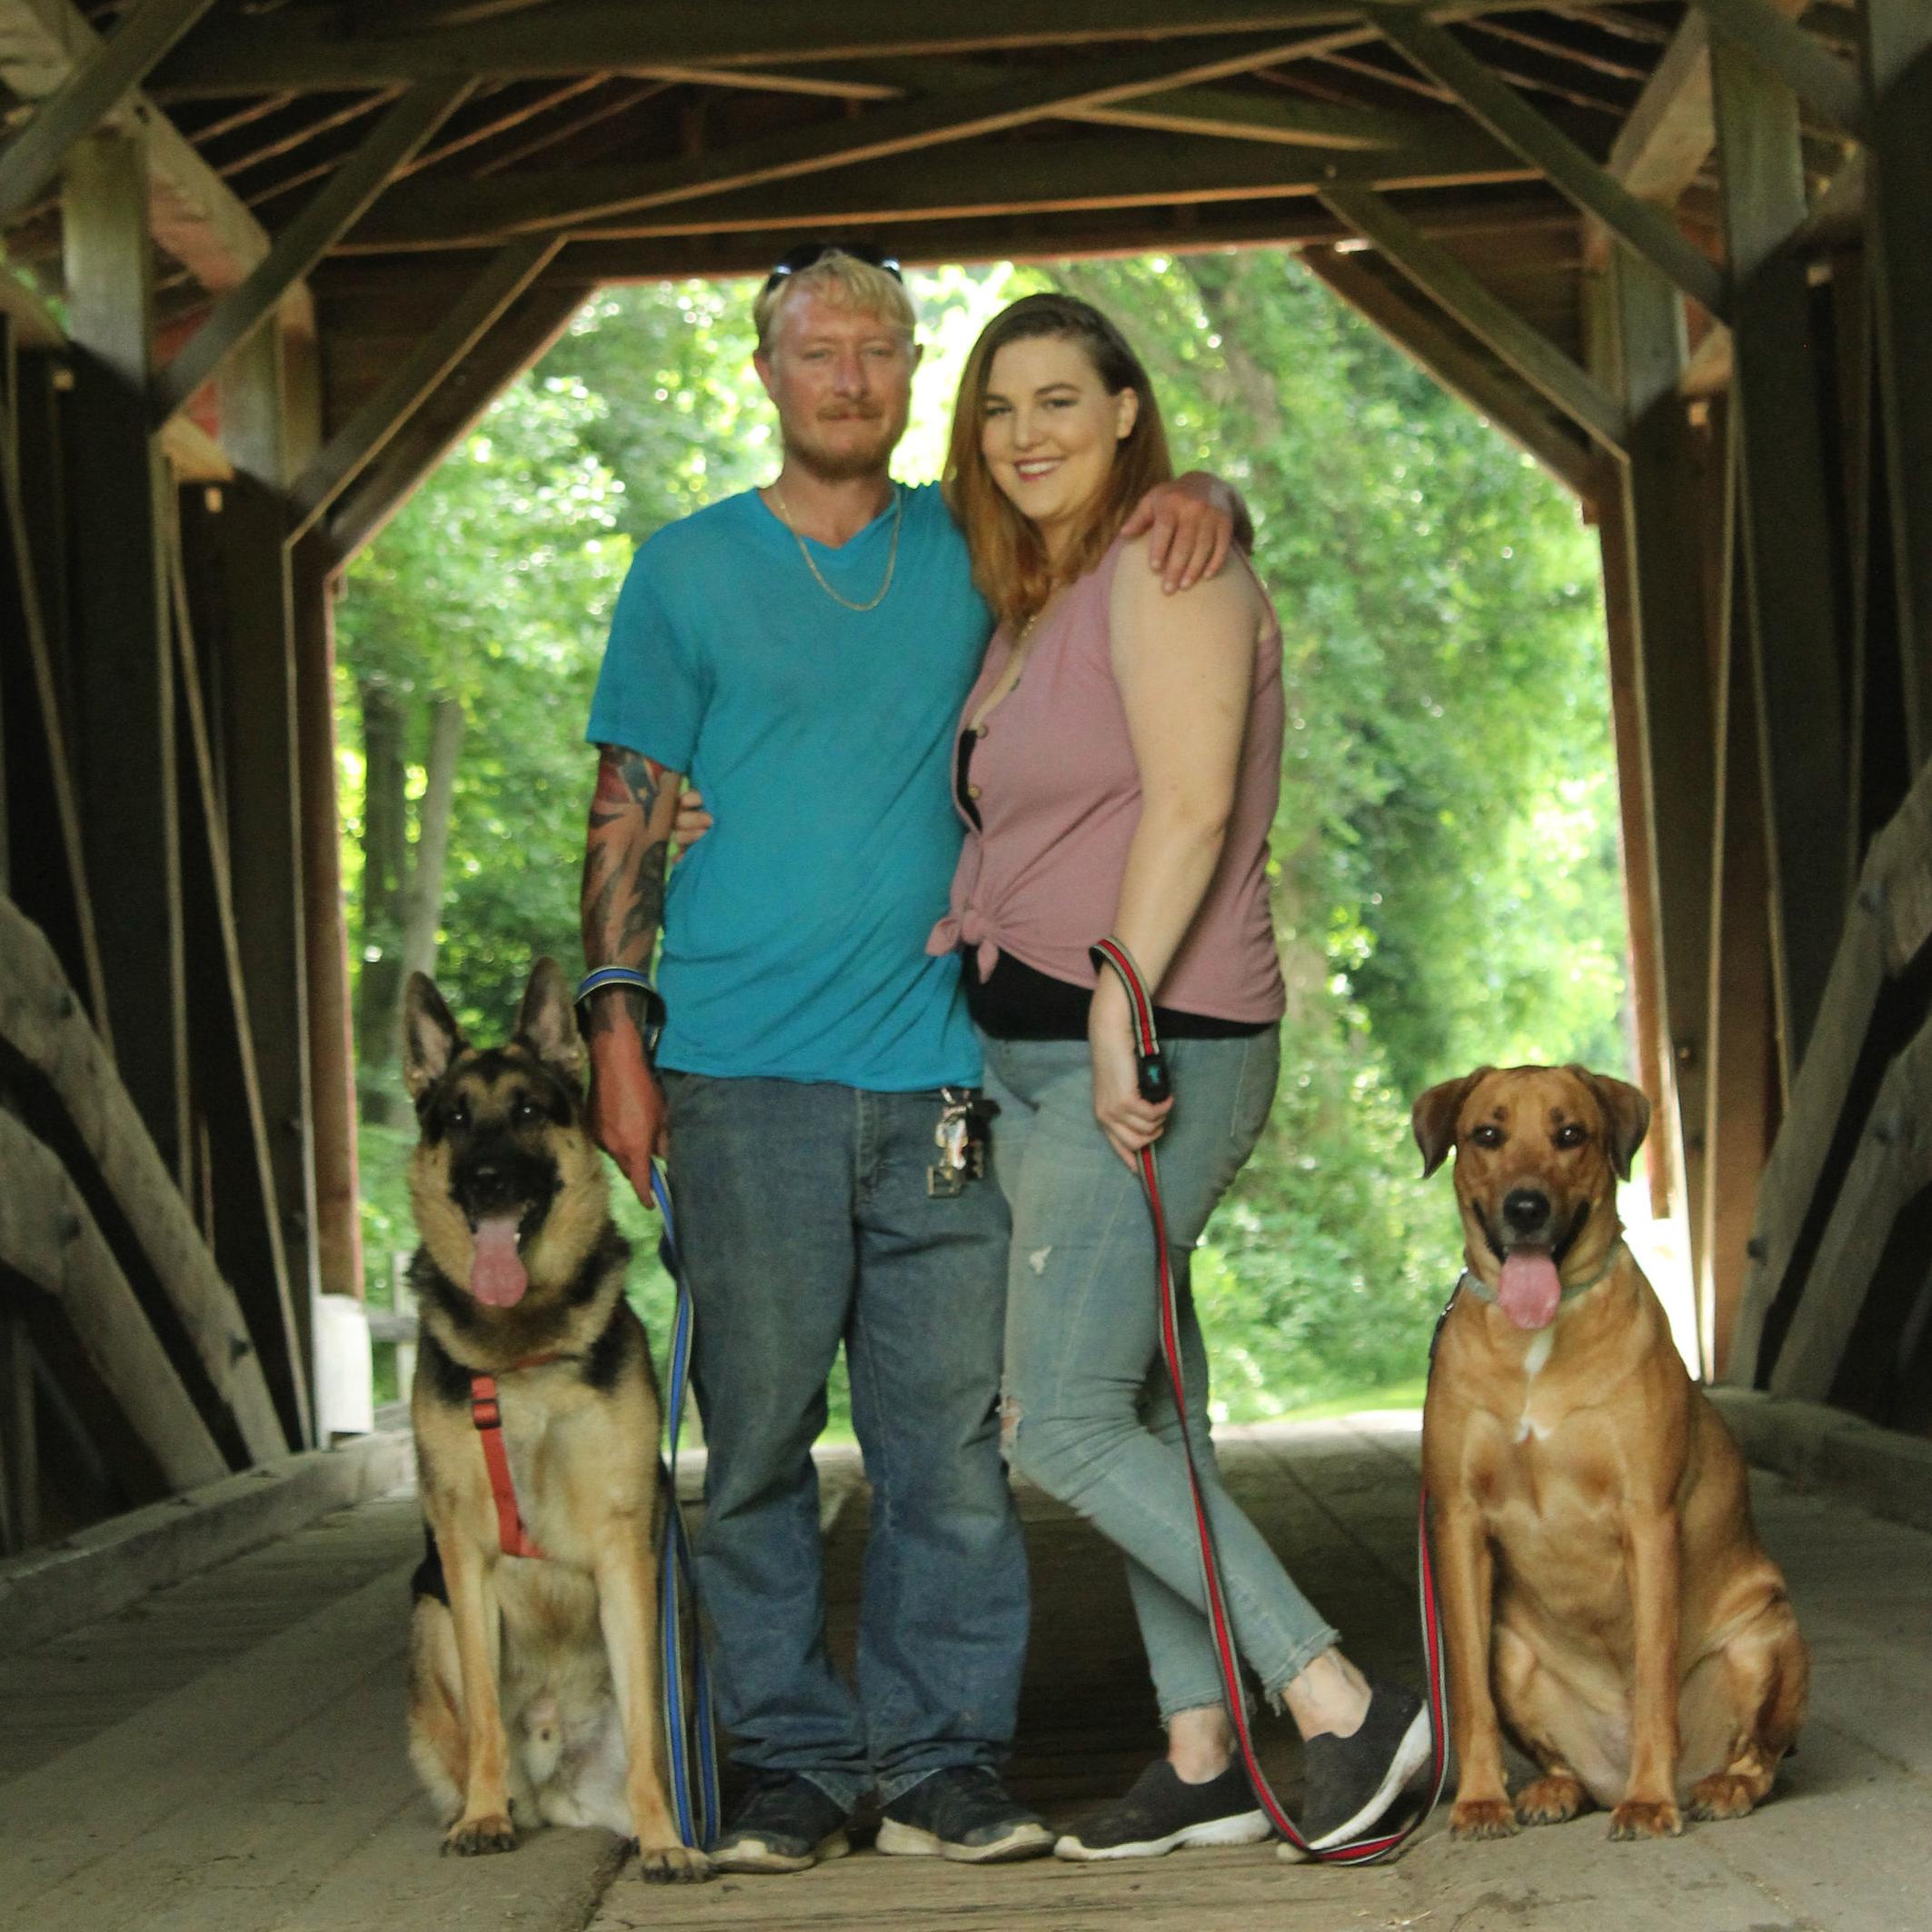 alexandra-craig-w-boyfriend-and-dogs